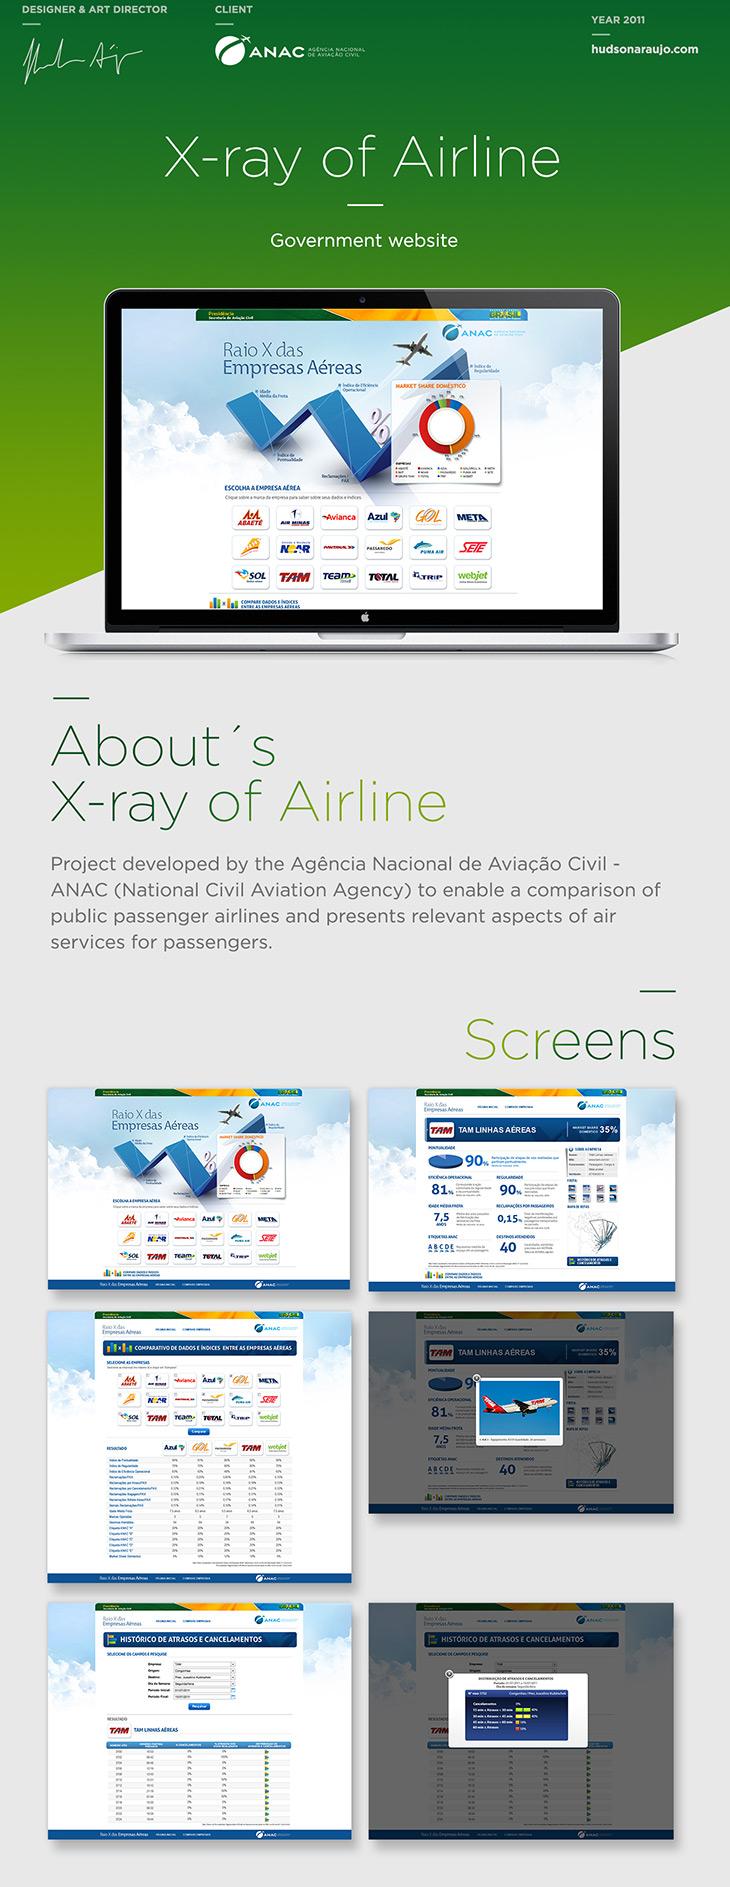 Xray Airline ANAC Hudson Araujo